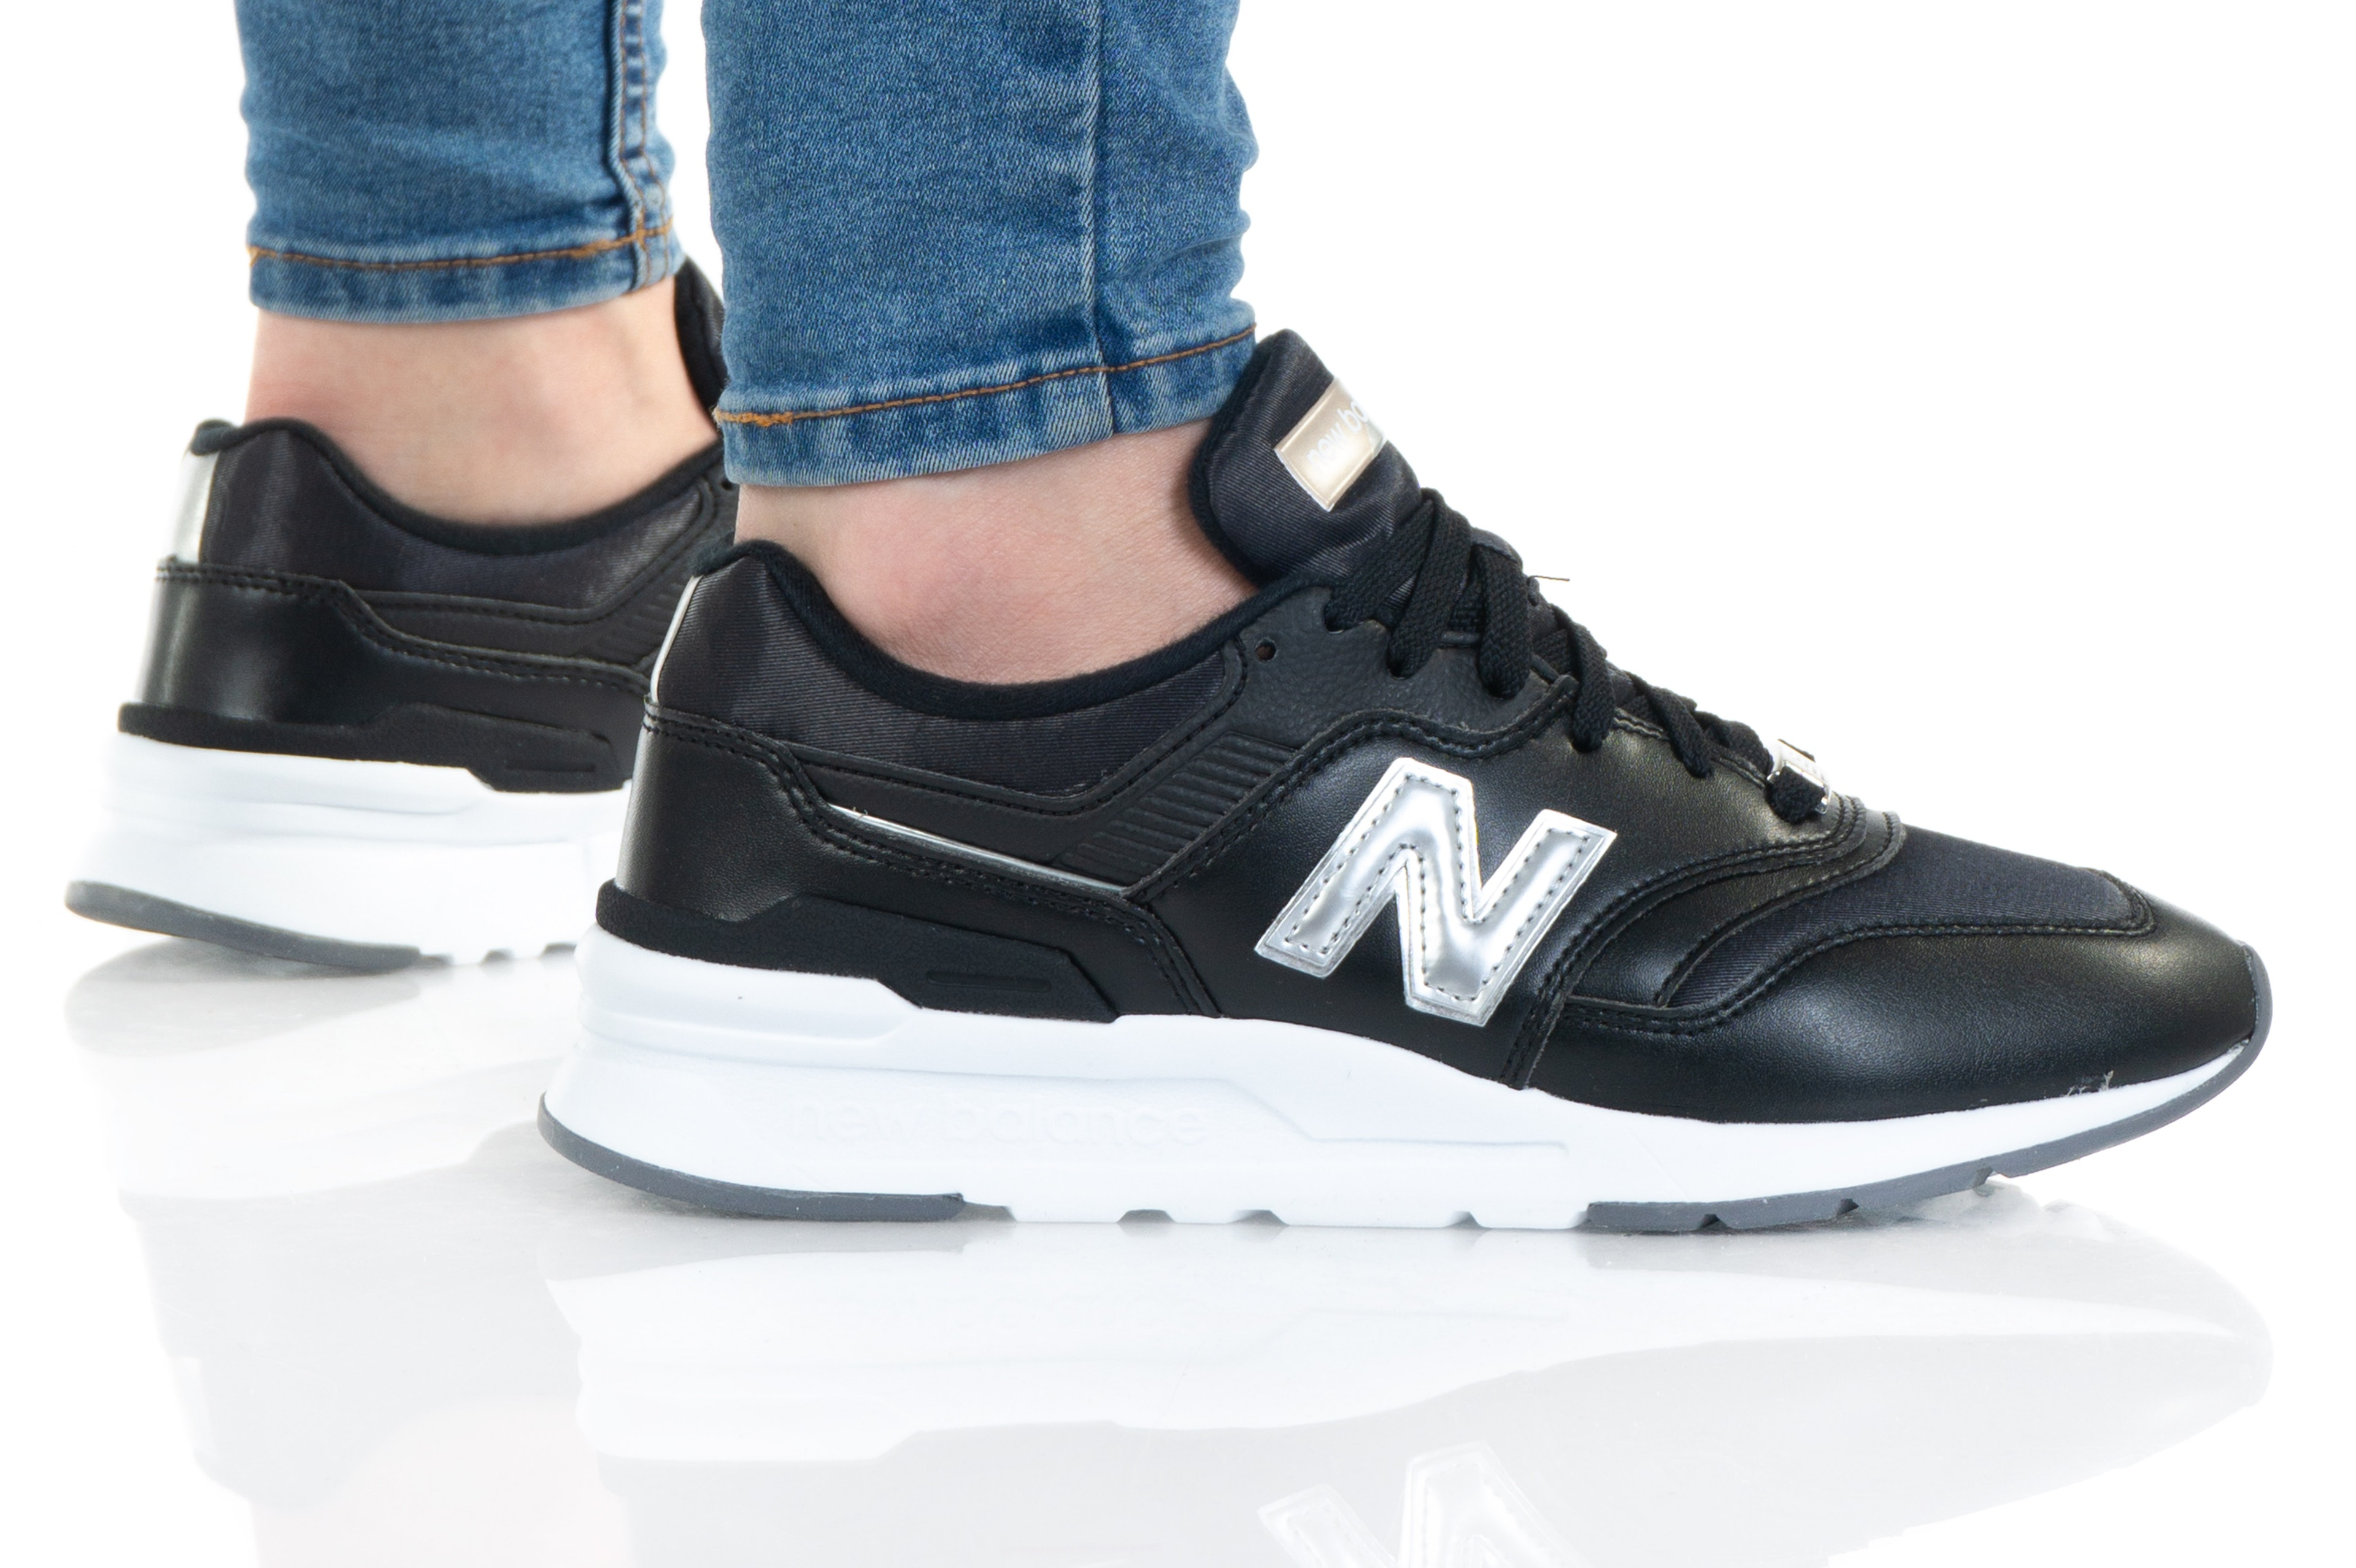 New Balance 997 CW997HMK